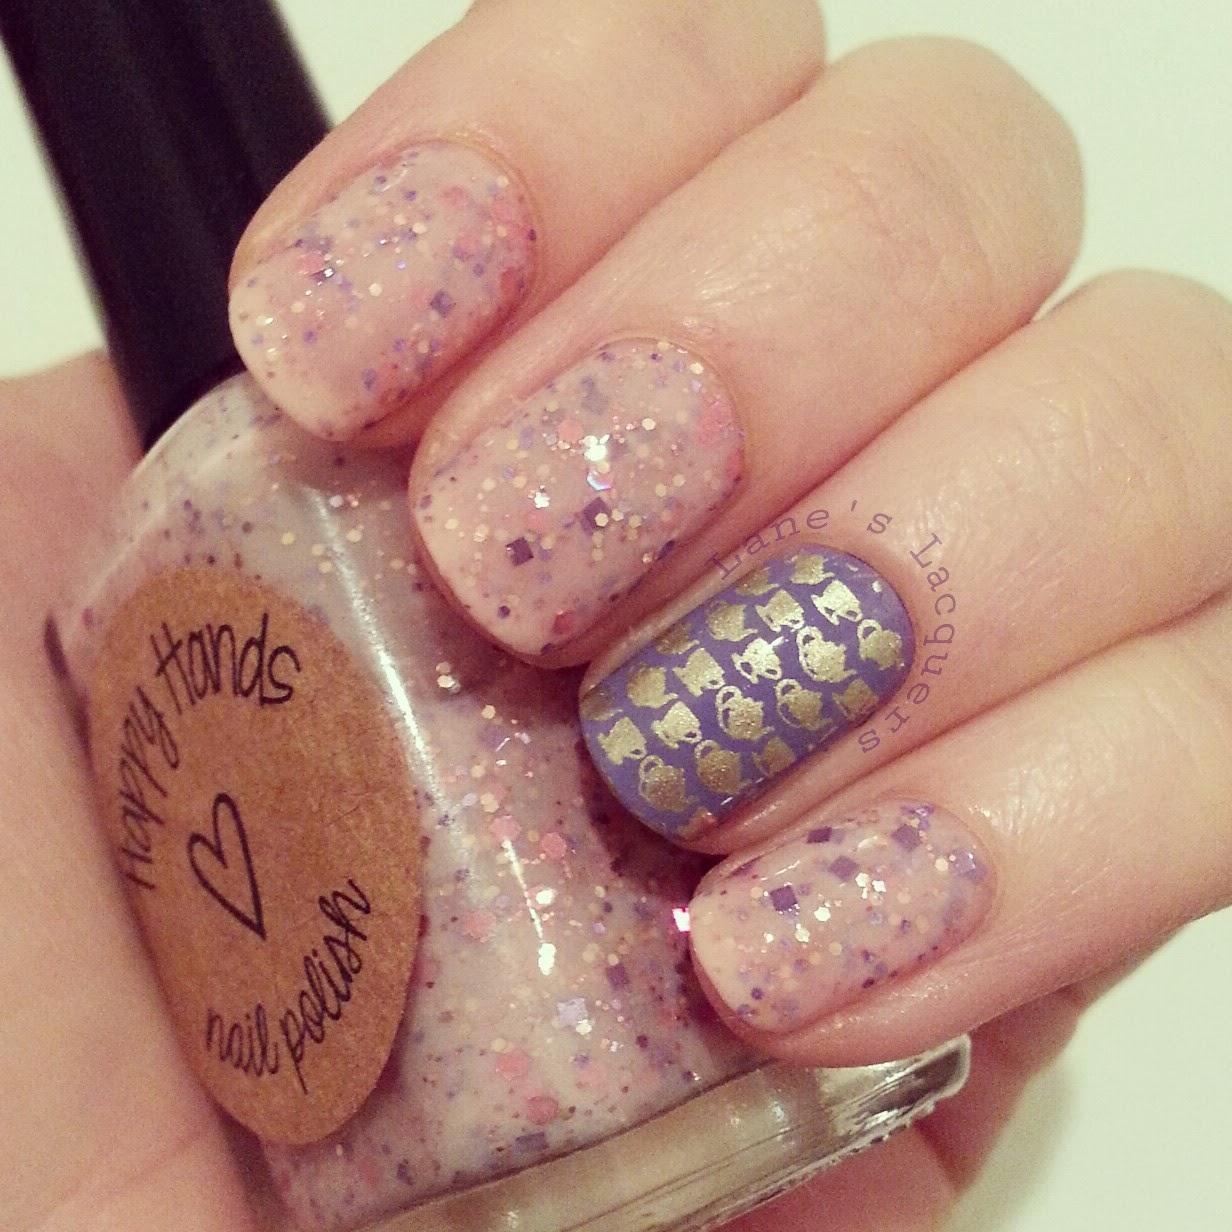 saturday-swatch-happy-hands-lady-goodman-nails